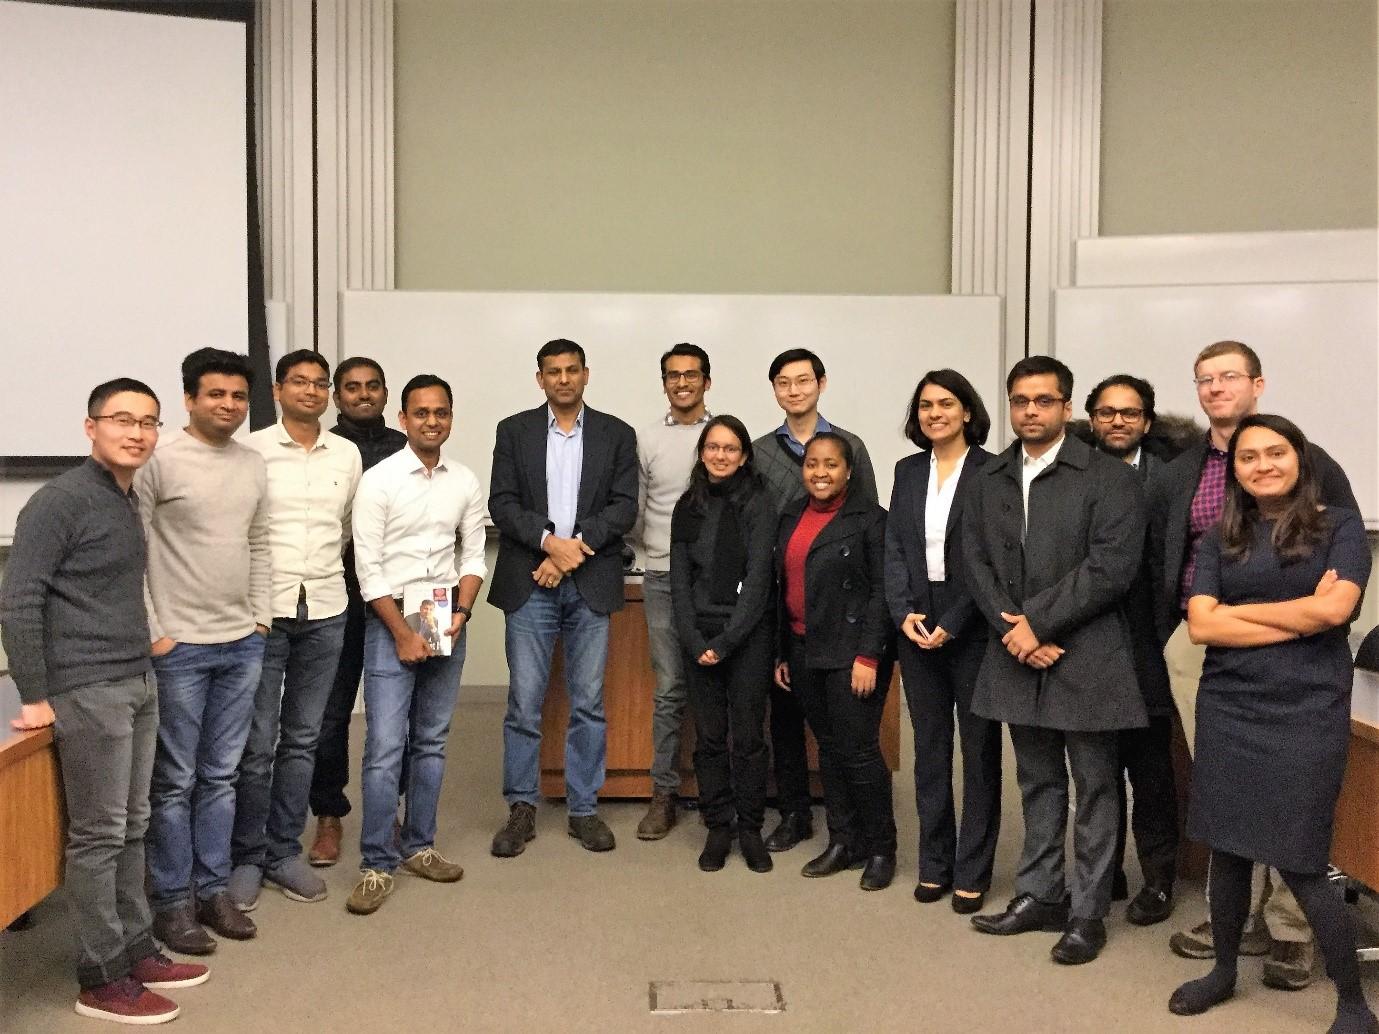 Booth students with Dr. Raghuram Rajan at Harper on November 27, 2018